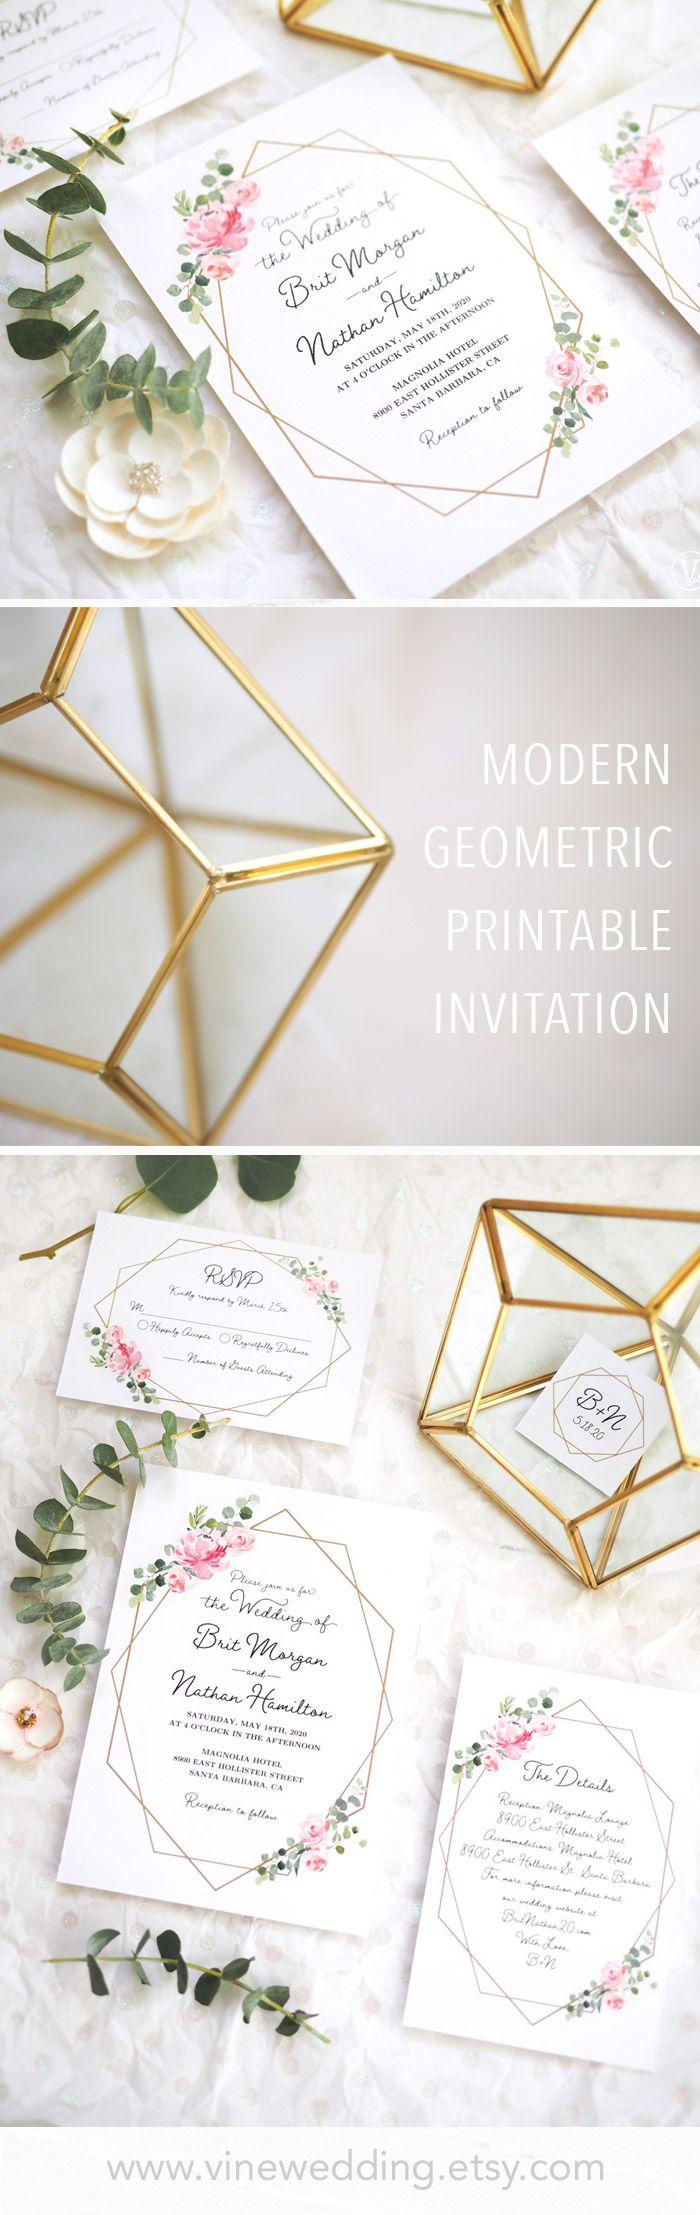 Blush Pink Wedding Invitation #weddinginvitations #blushpink #weddings #vinewedding